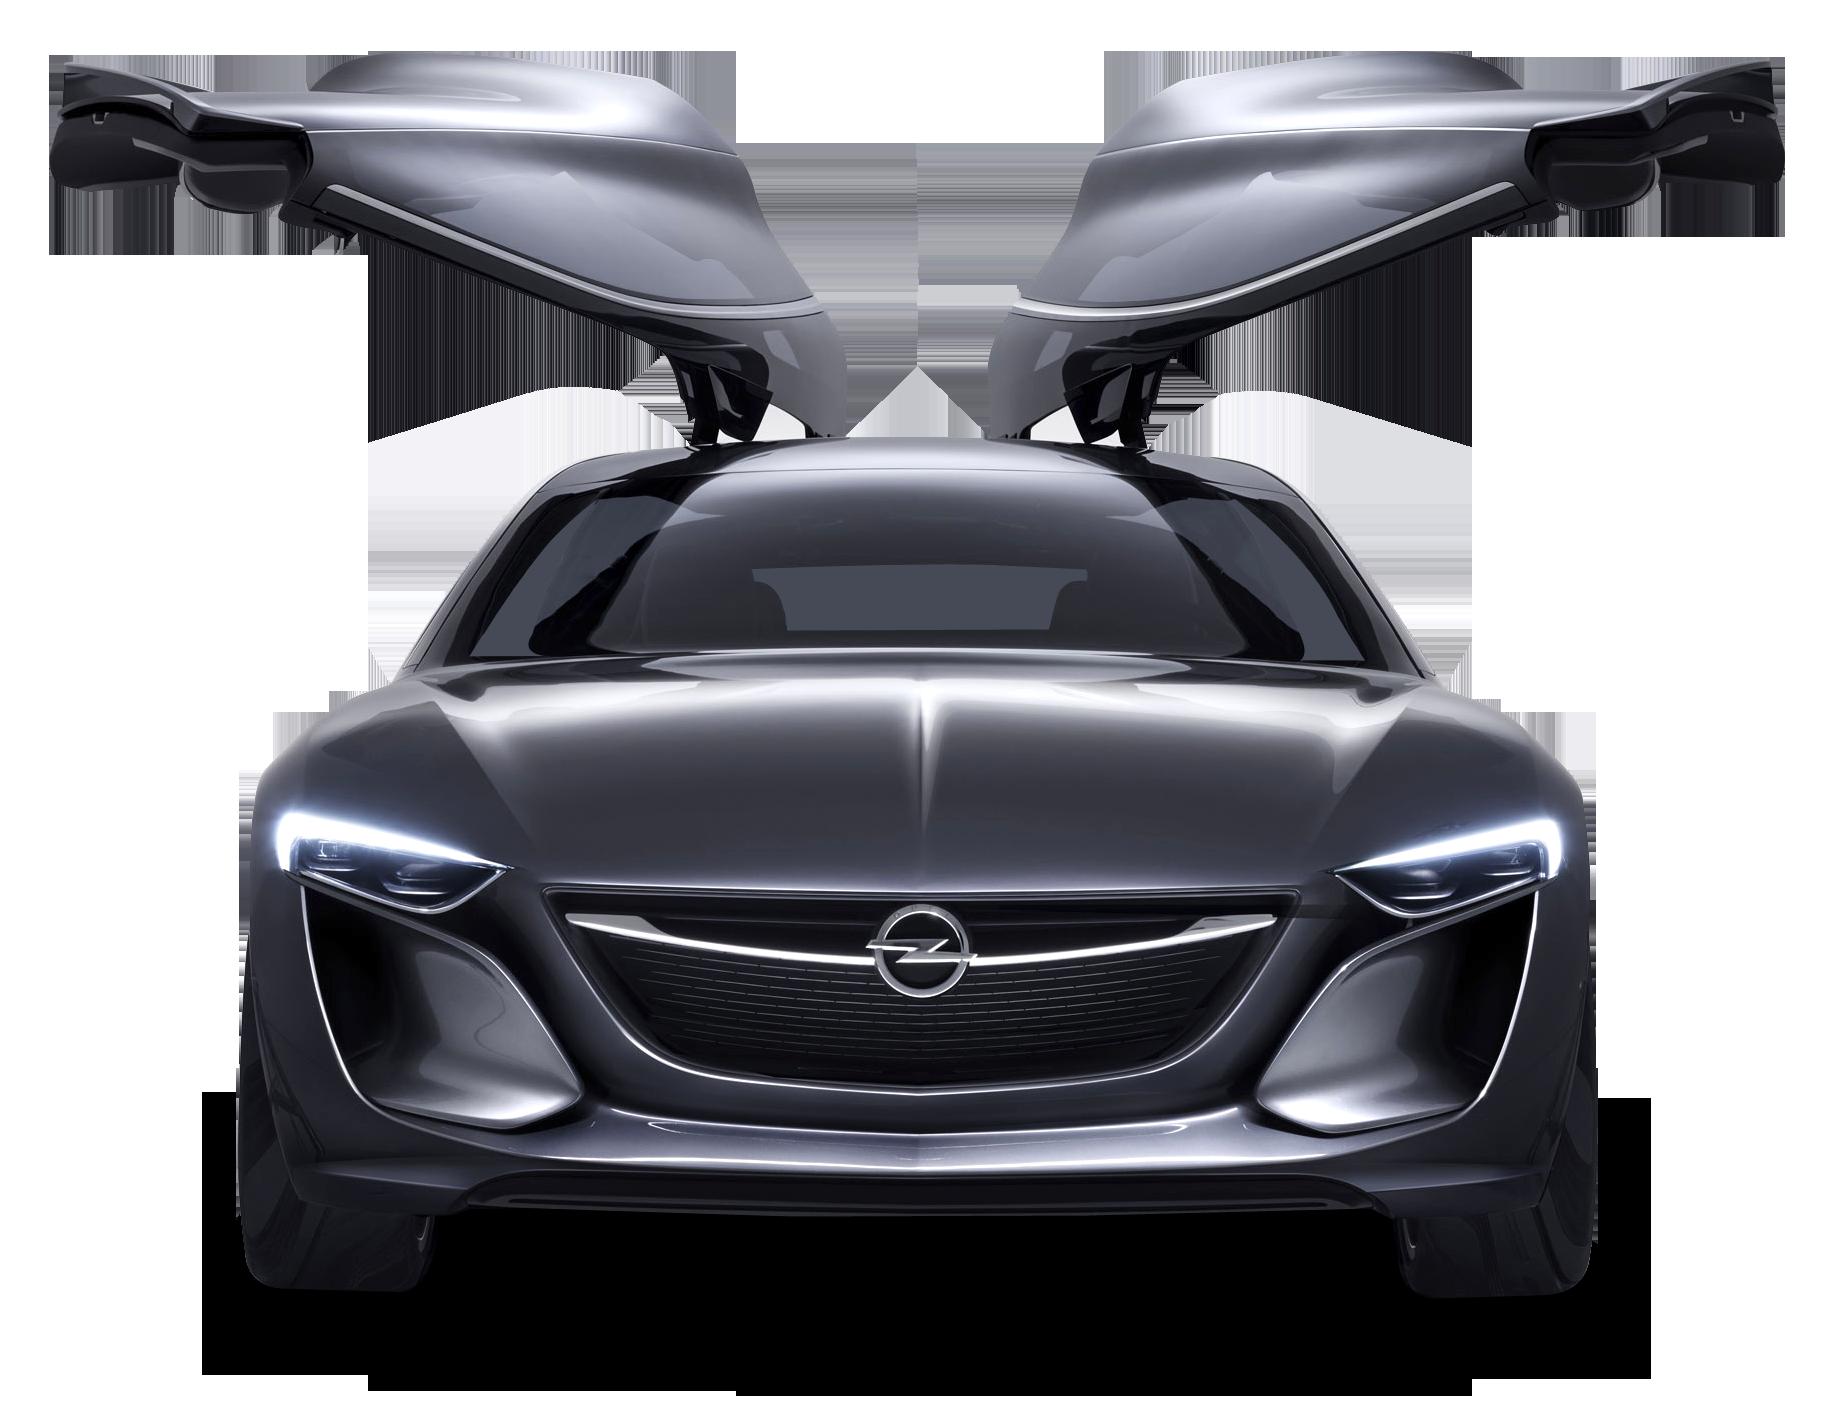 Opel Monza Doors Open Car Png Image Purepng Free Transparent Cc0